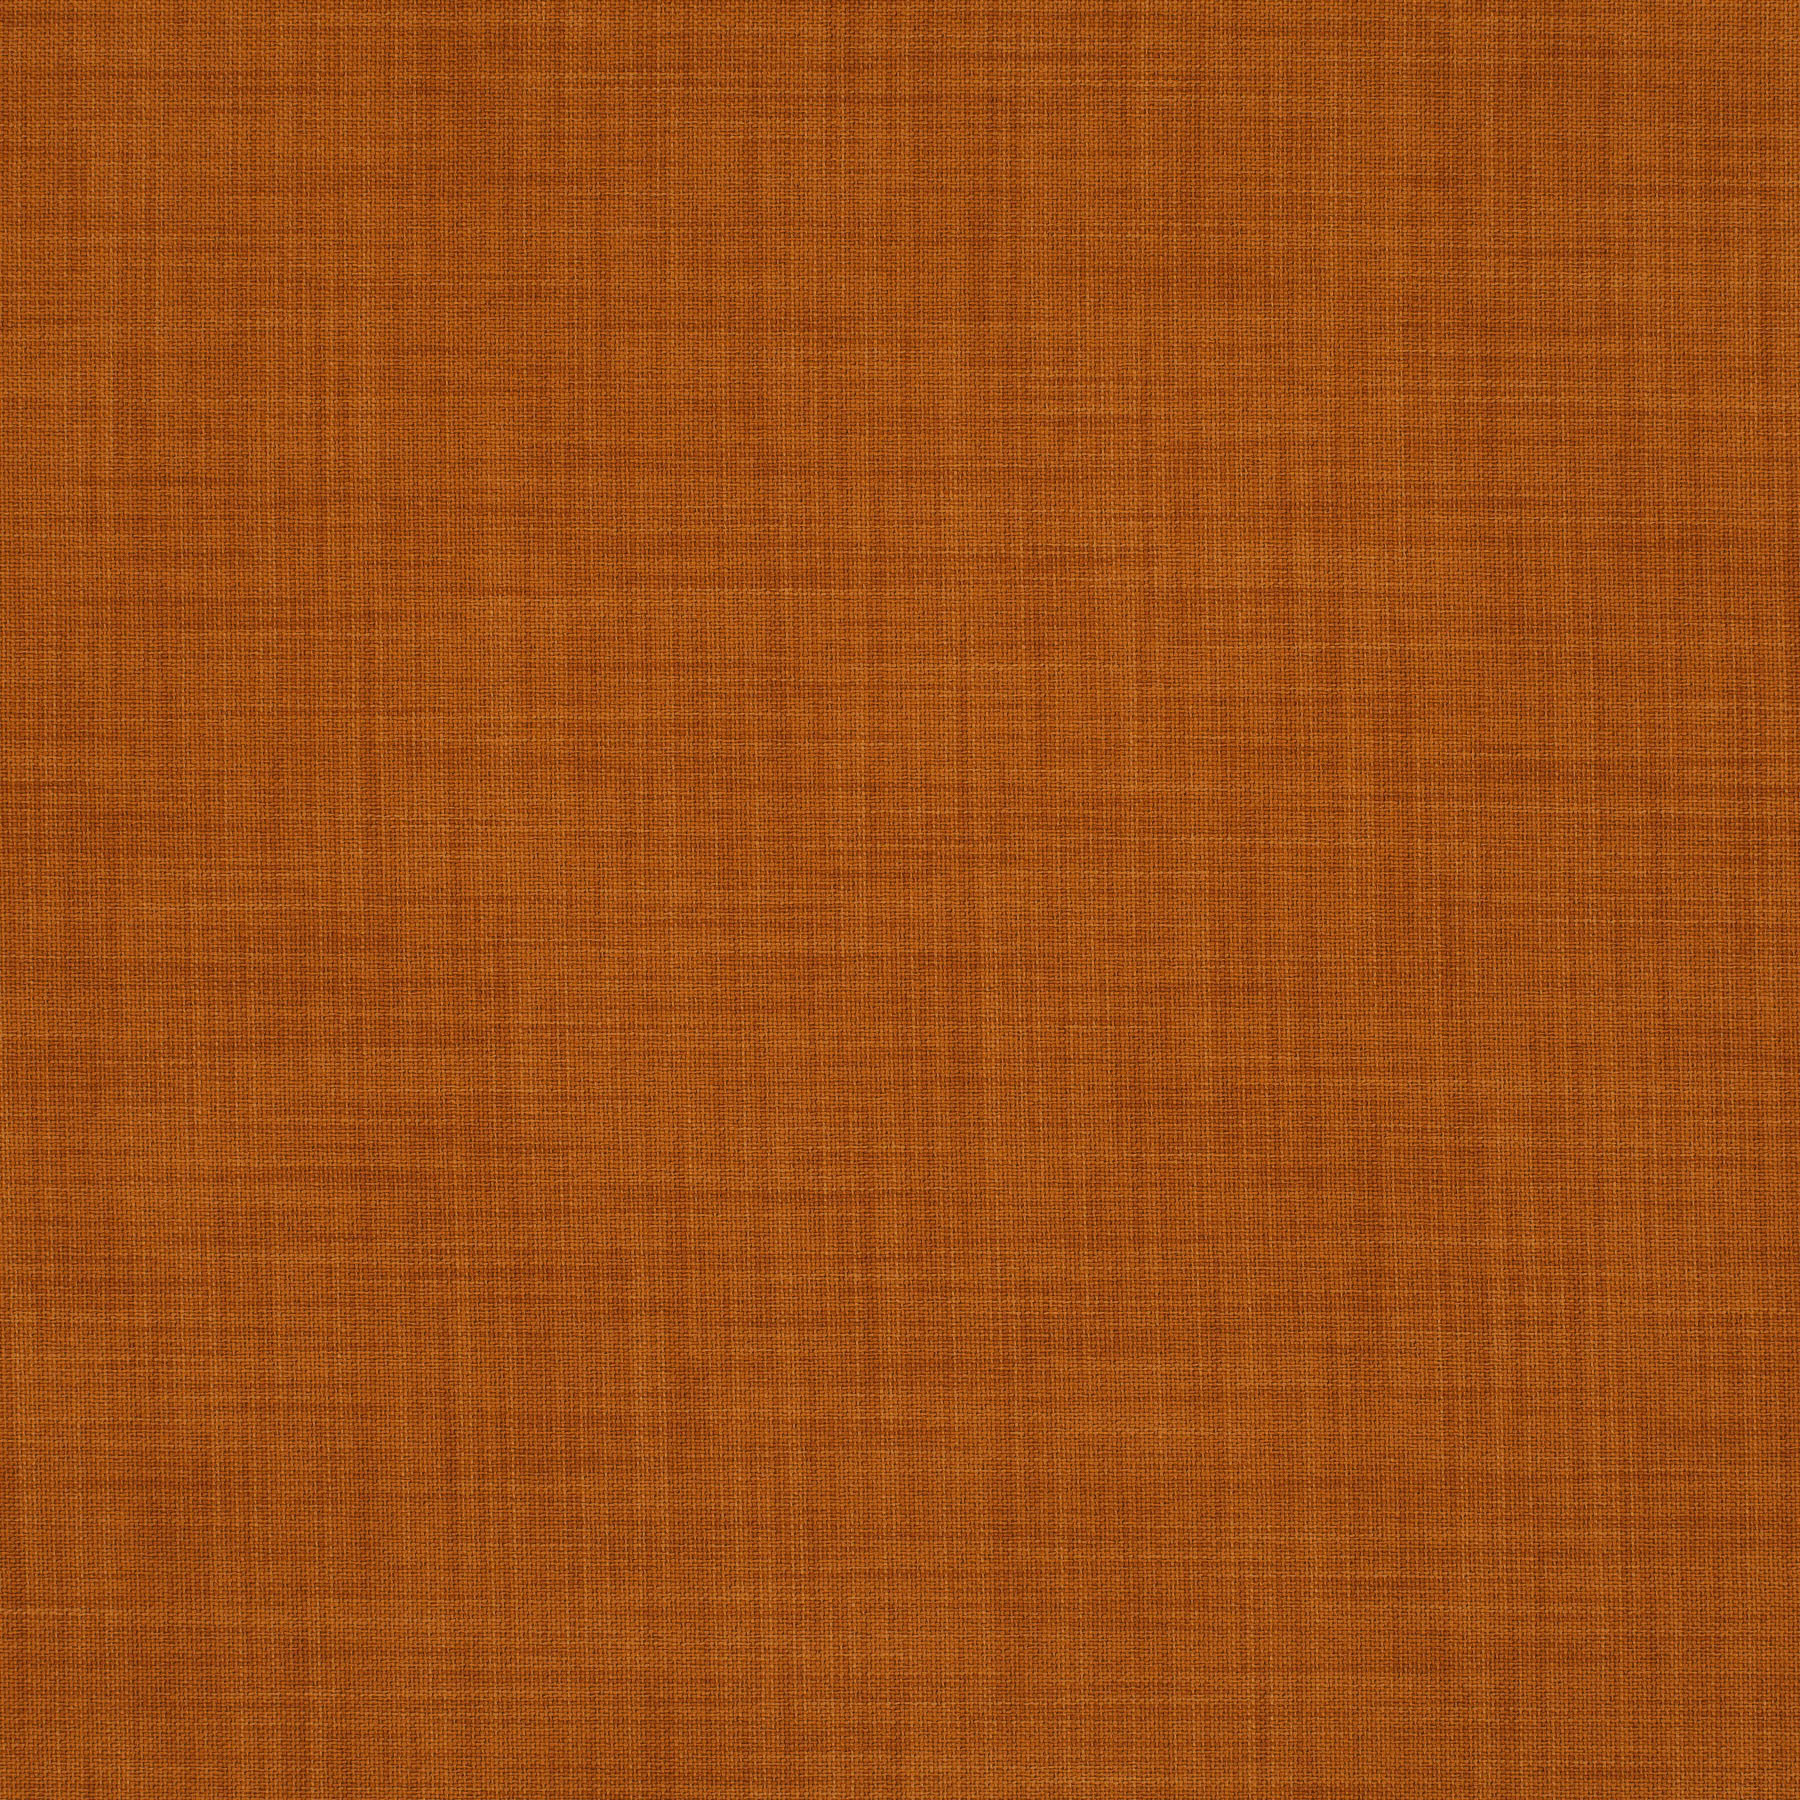 decoration fabric cosmos ch2657 061 jab anstoetz. Black Bedroom Furniture Sets. Home Design Ideas